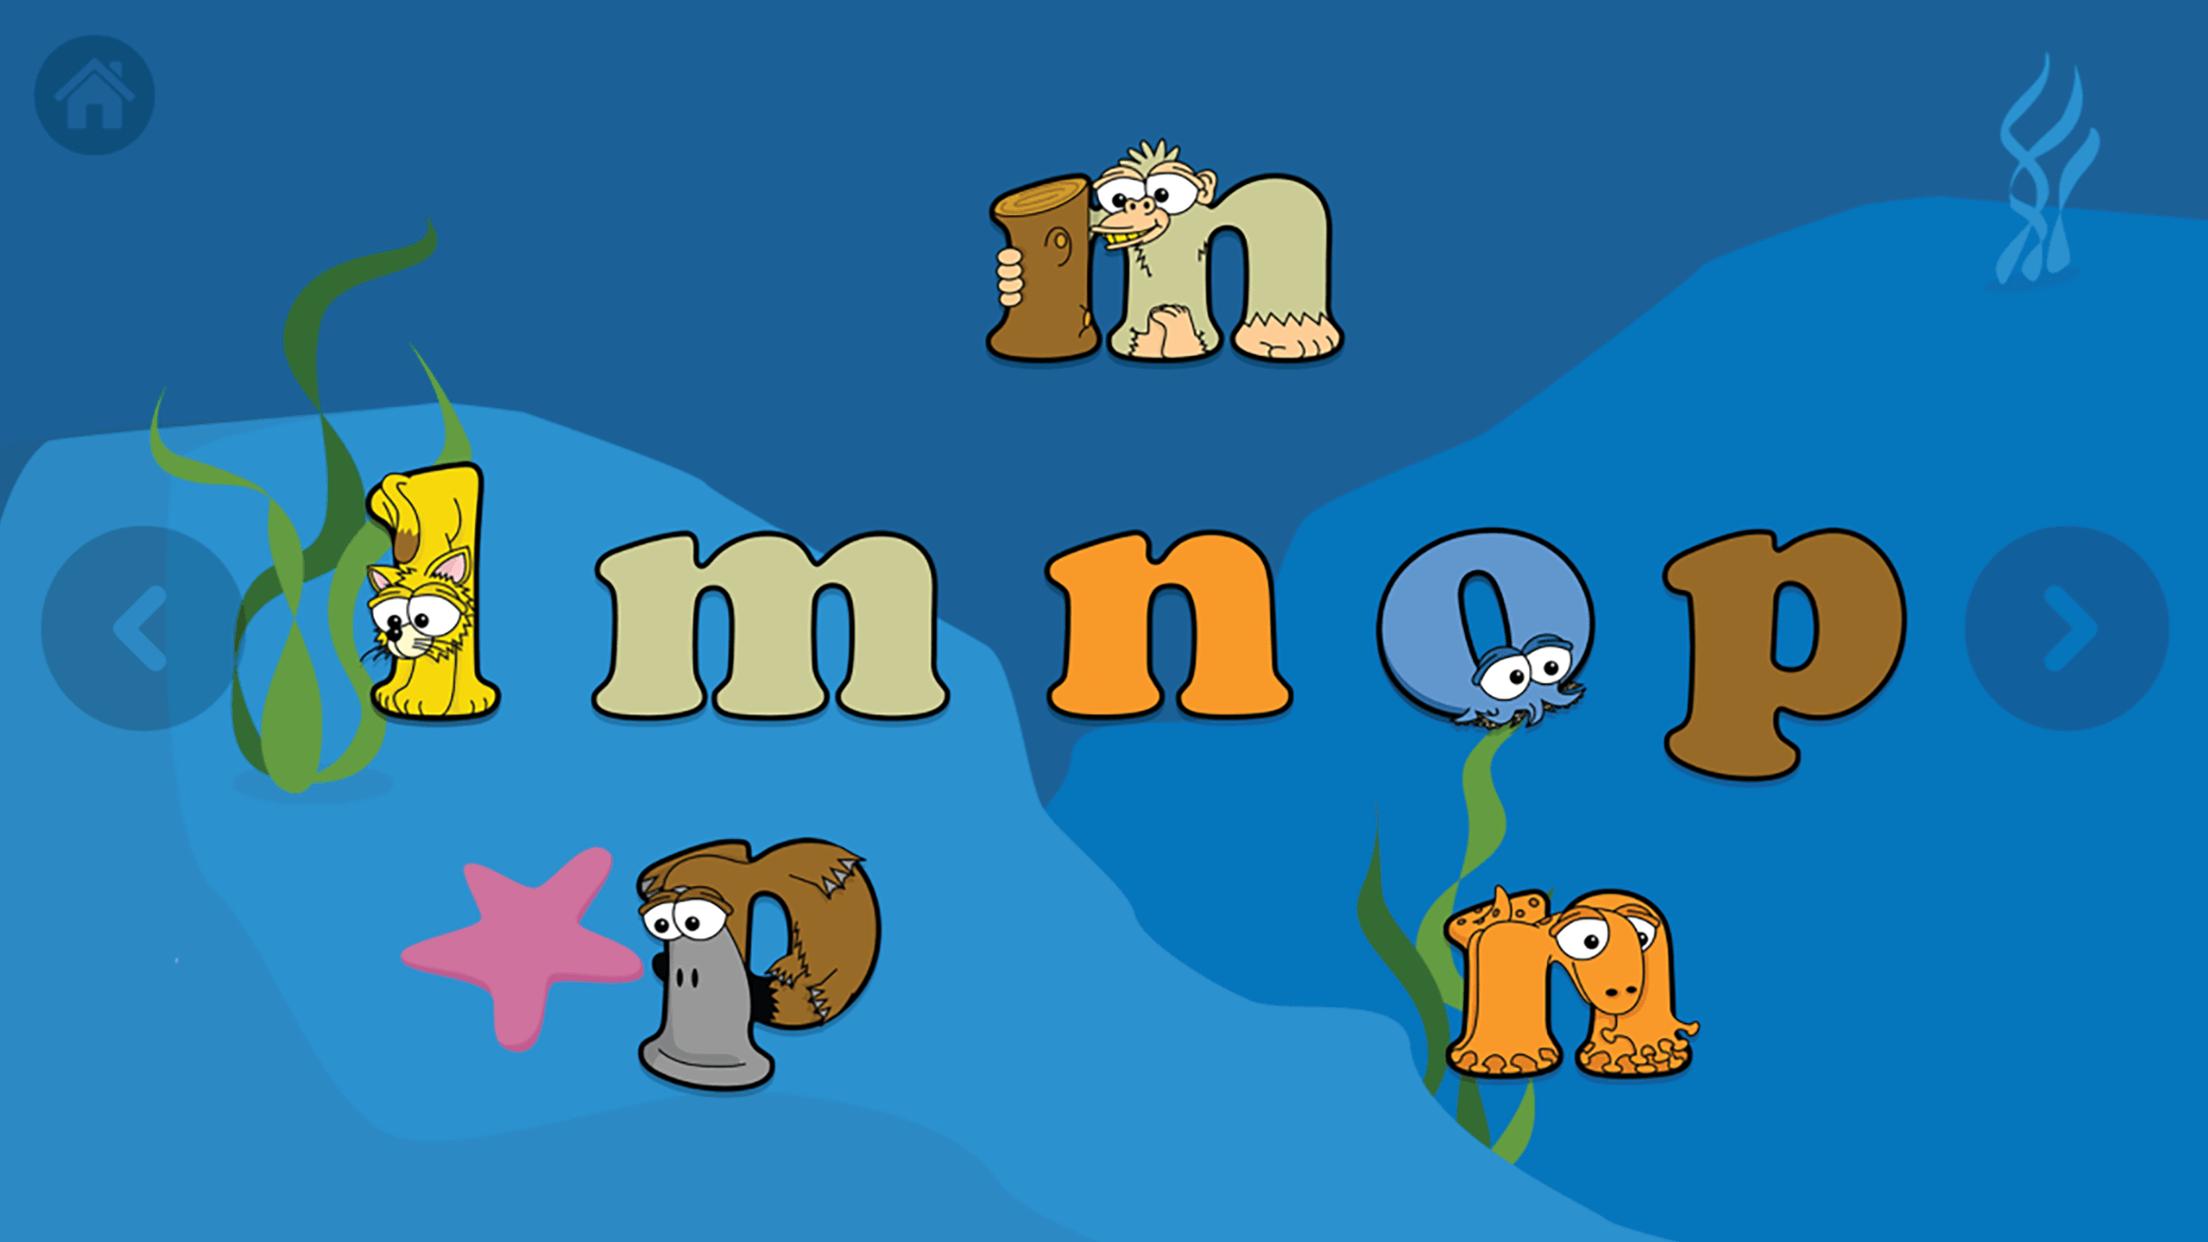 Alphabetimals App Lowercase Letters Screen